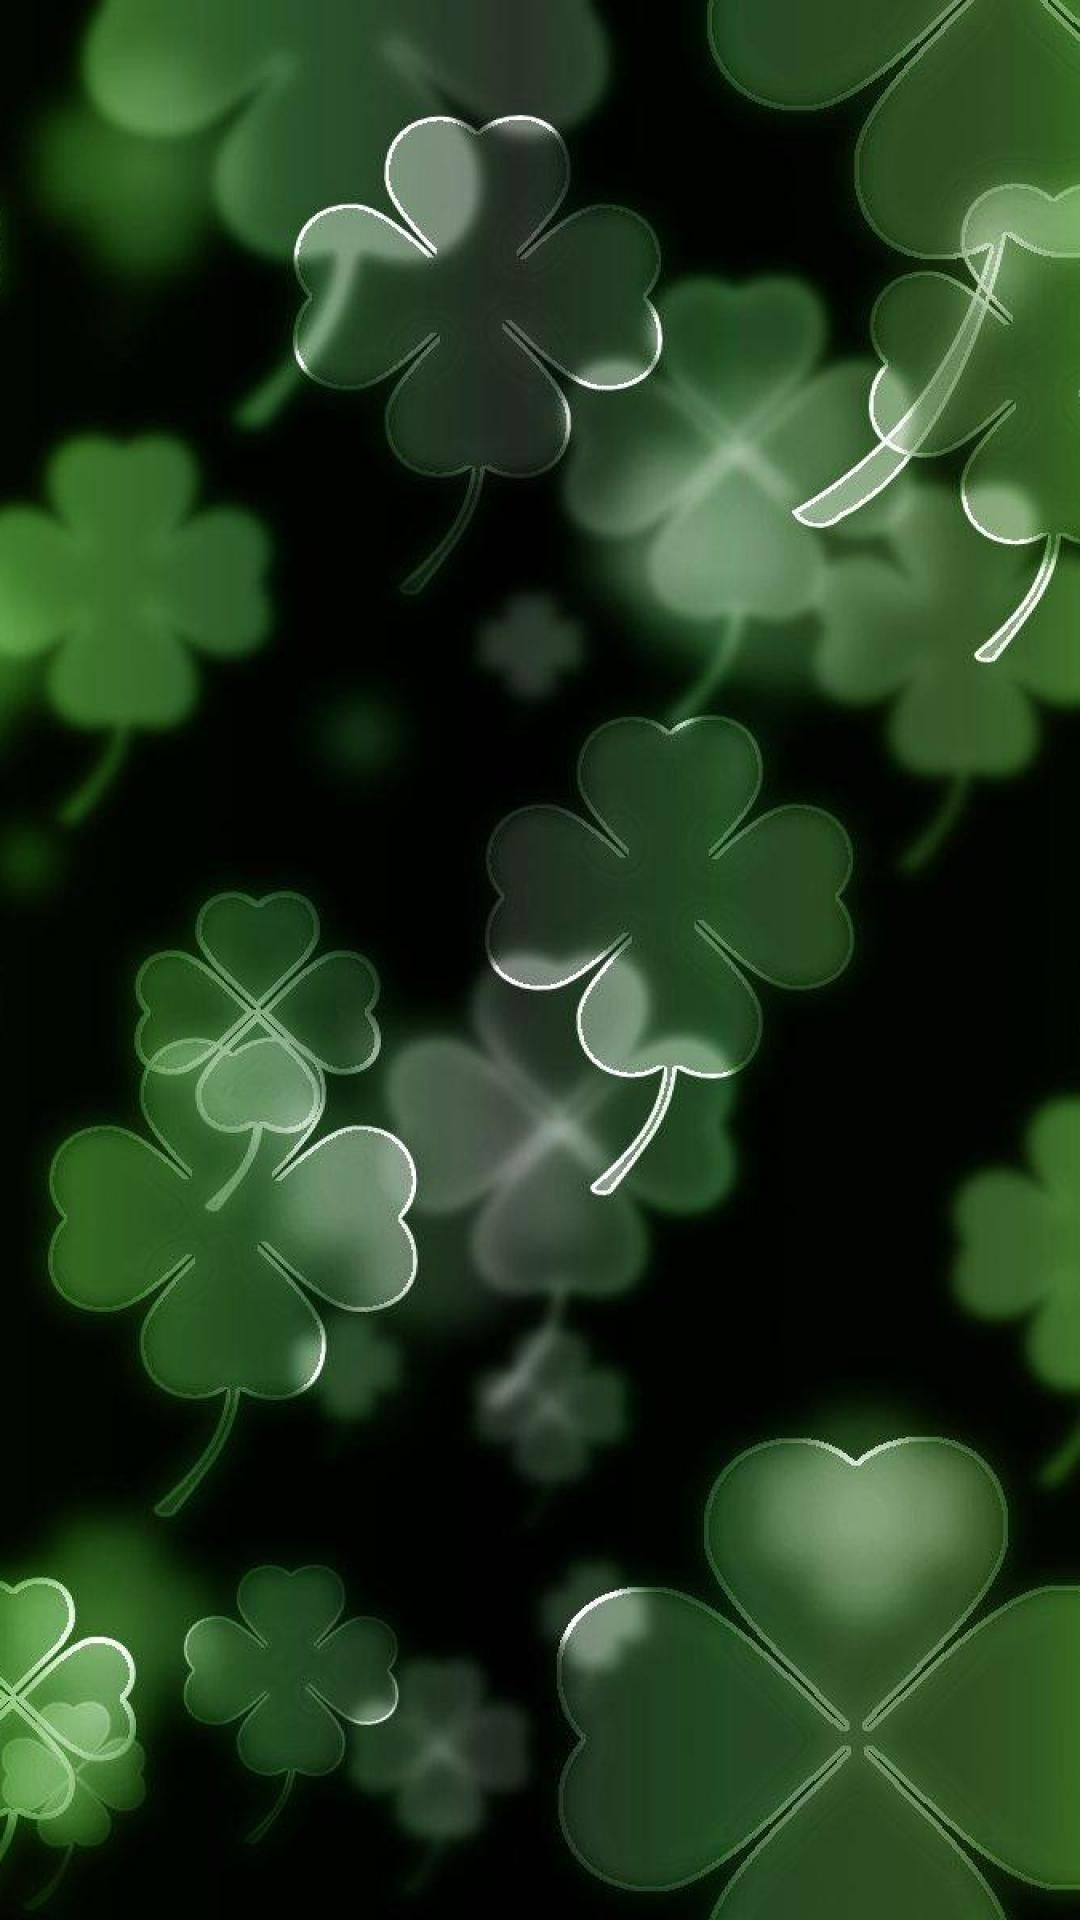 Ireland live wallpaper iPhone